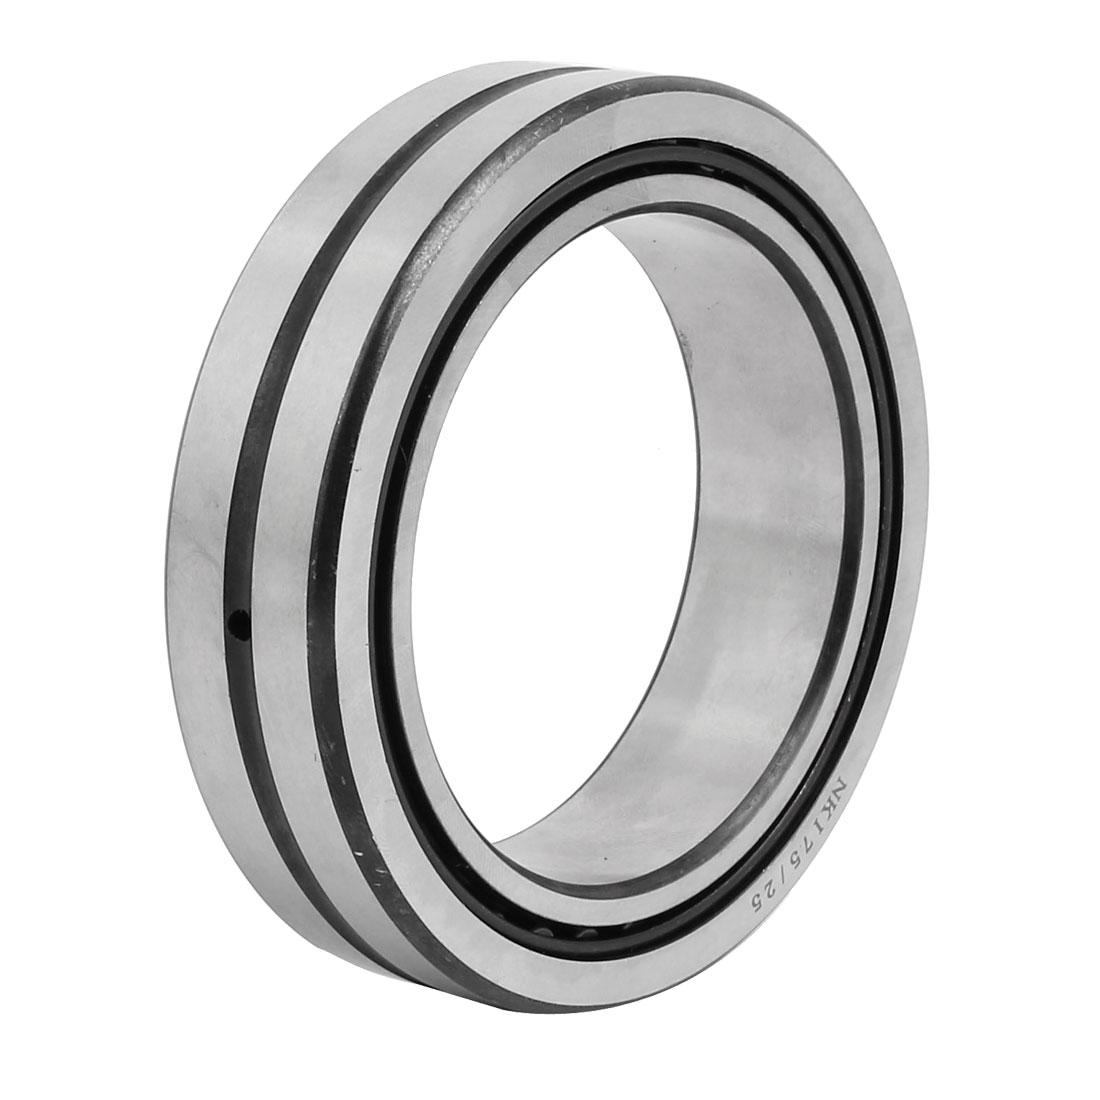 NKI75/25 75mmx105mmx25mm Inner Ring Needle Roller Bearing Silver Tone